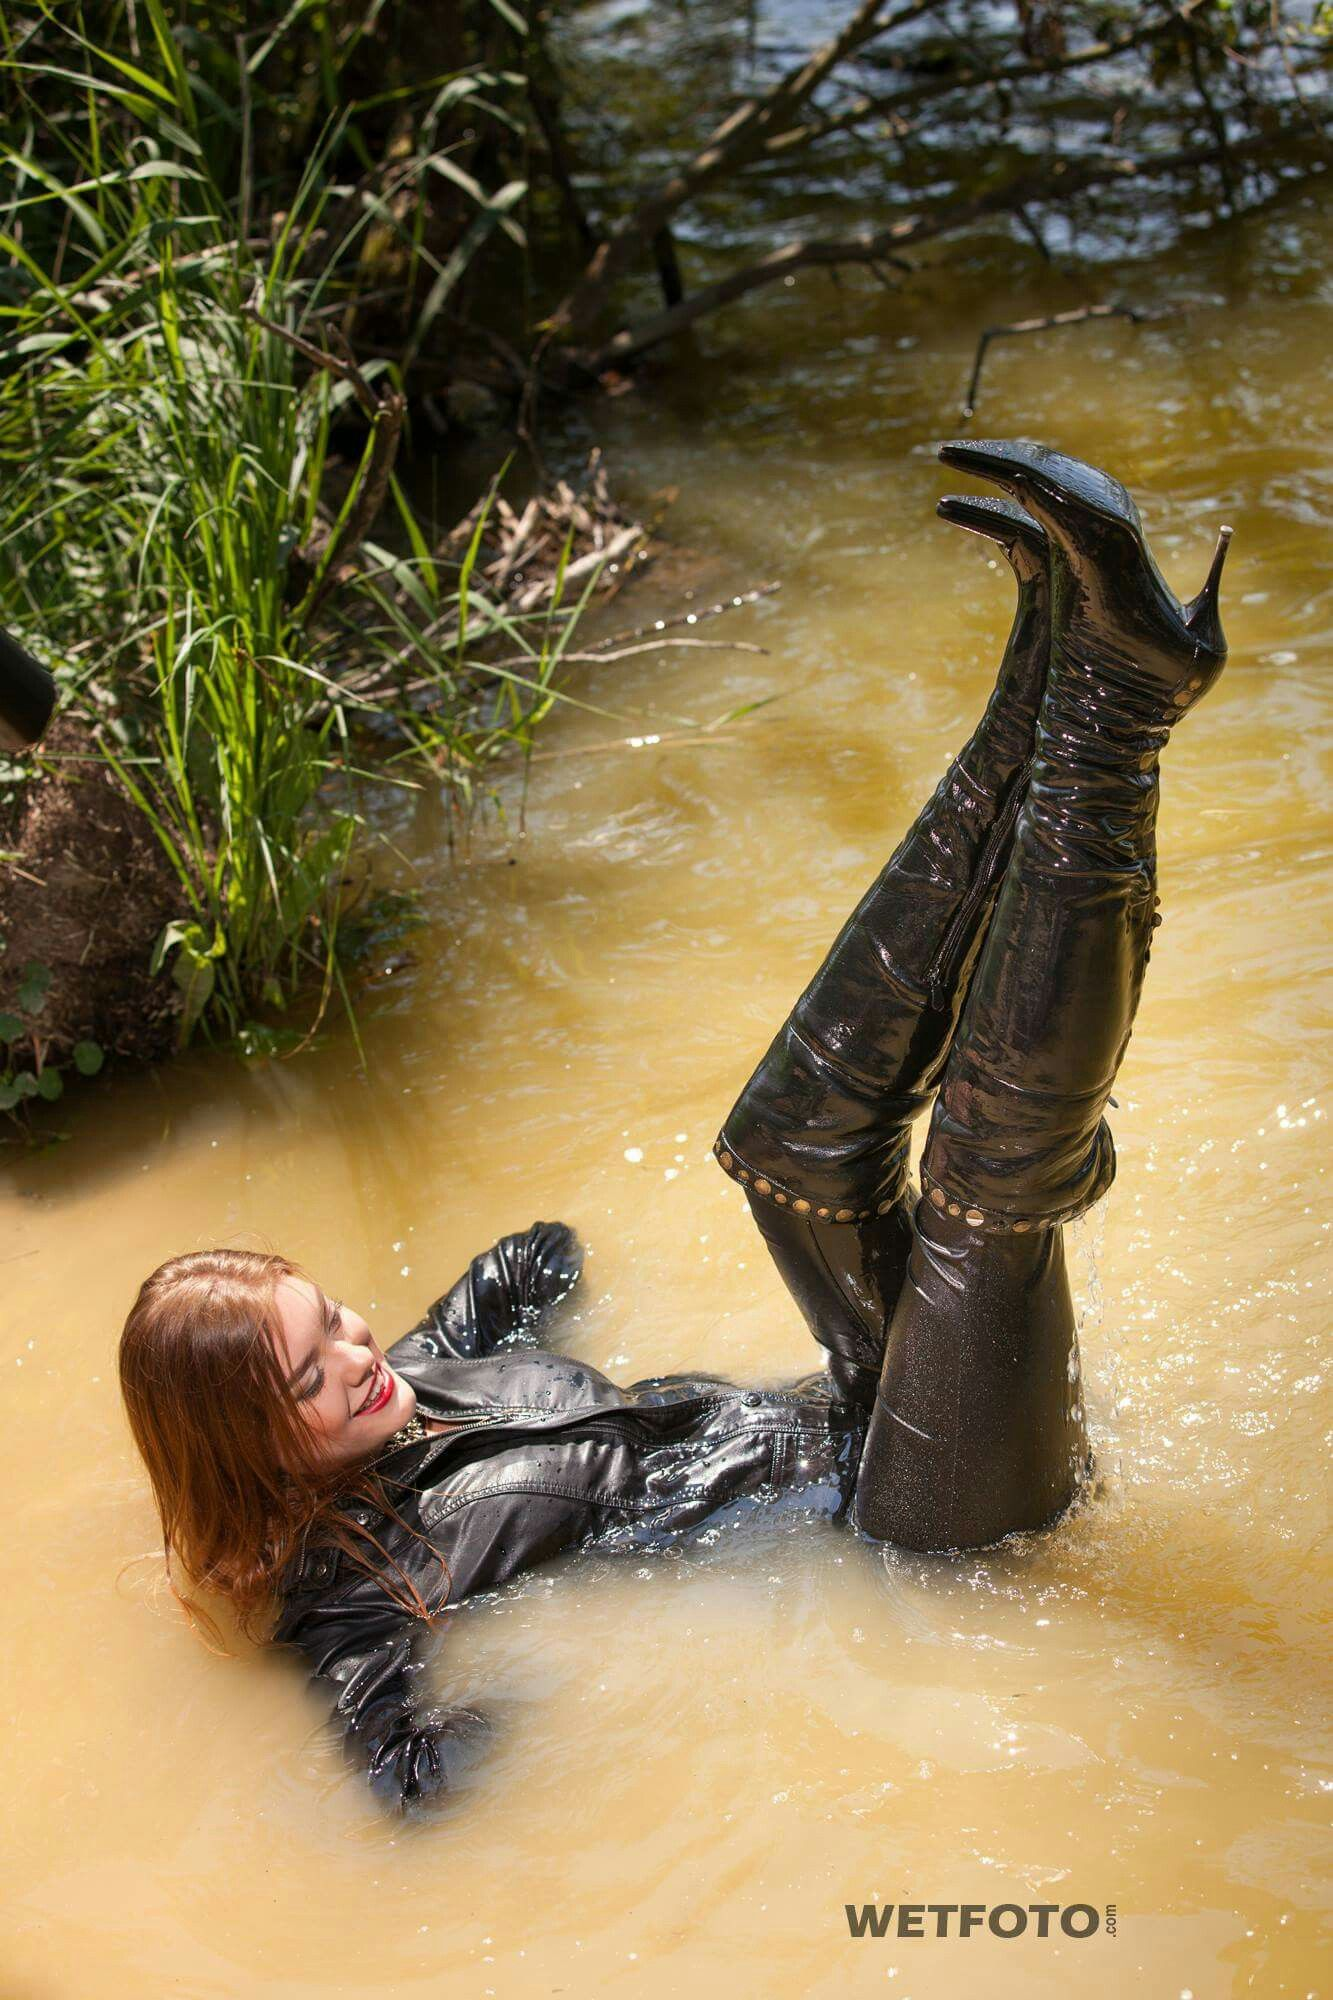 Muddy thigh boots in a summer dress